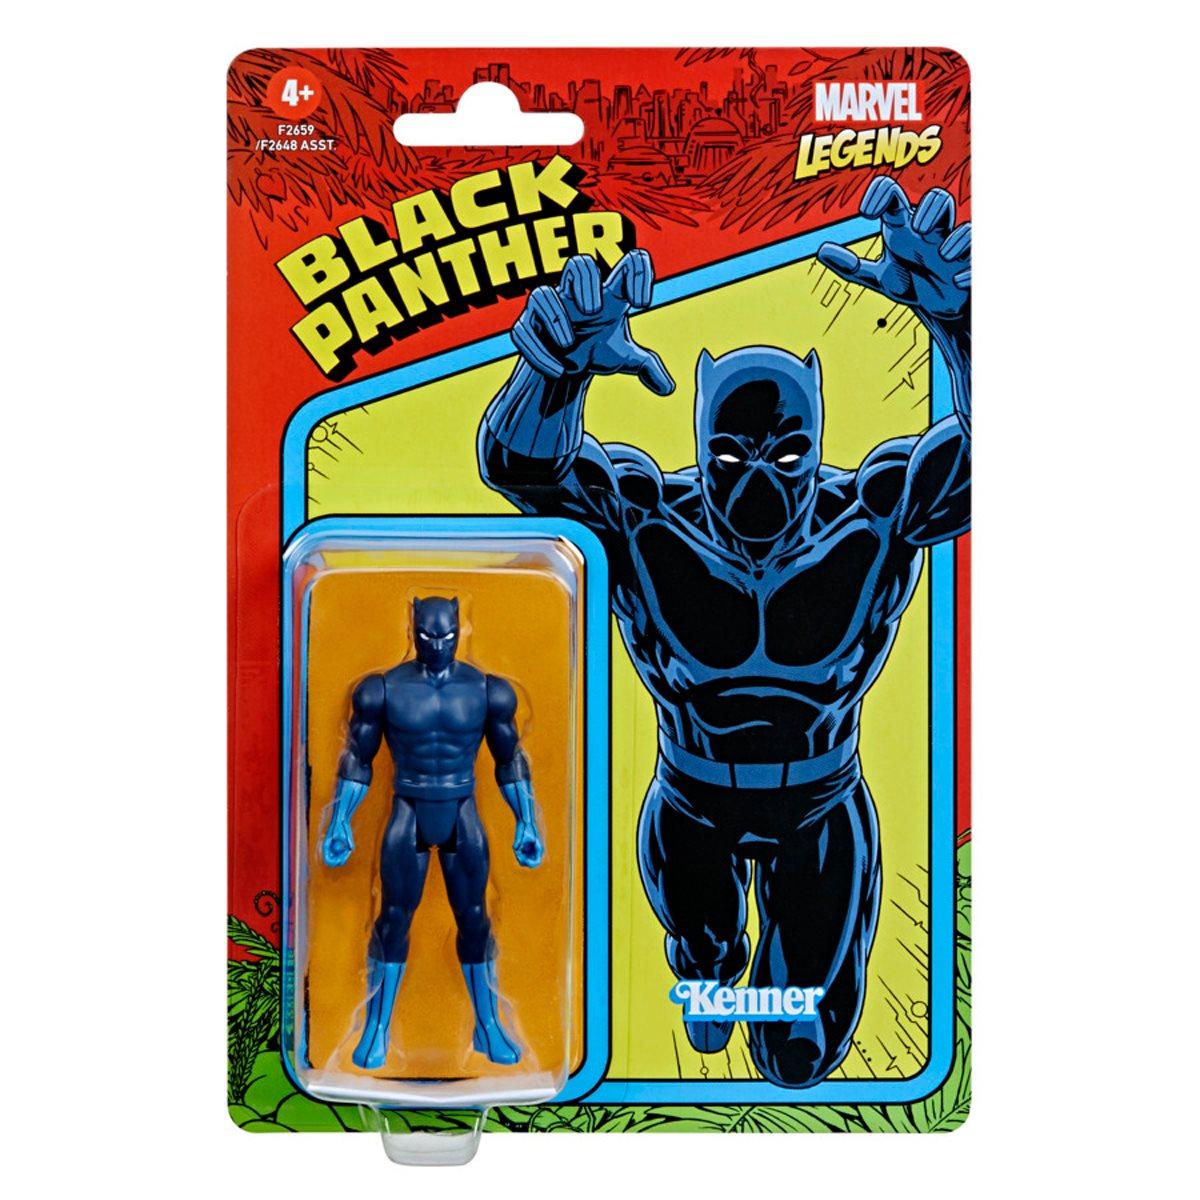 Hasbro-Marvel-Legends-Retro-Black-Panther-002